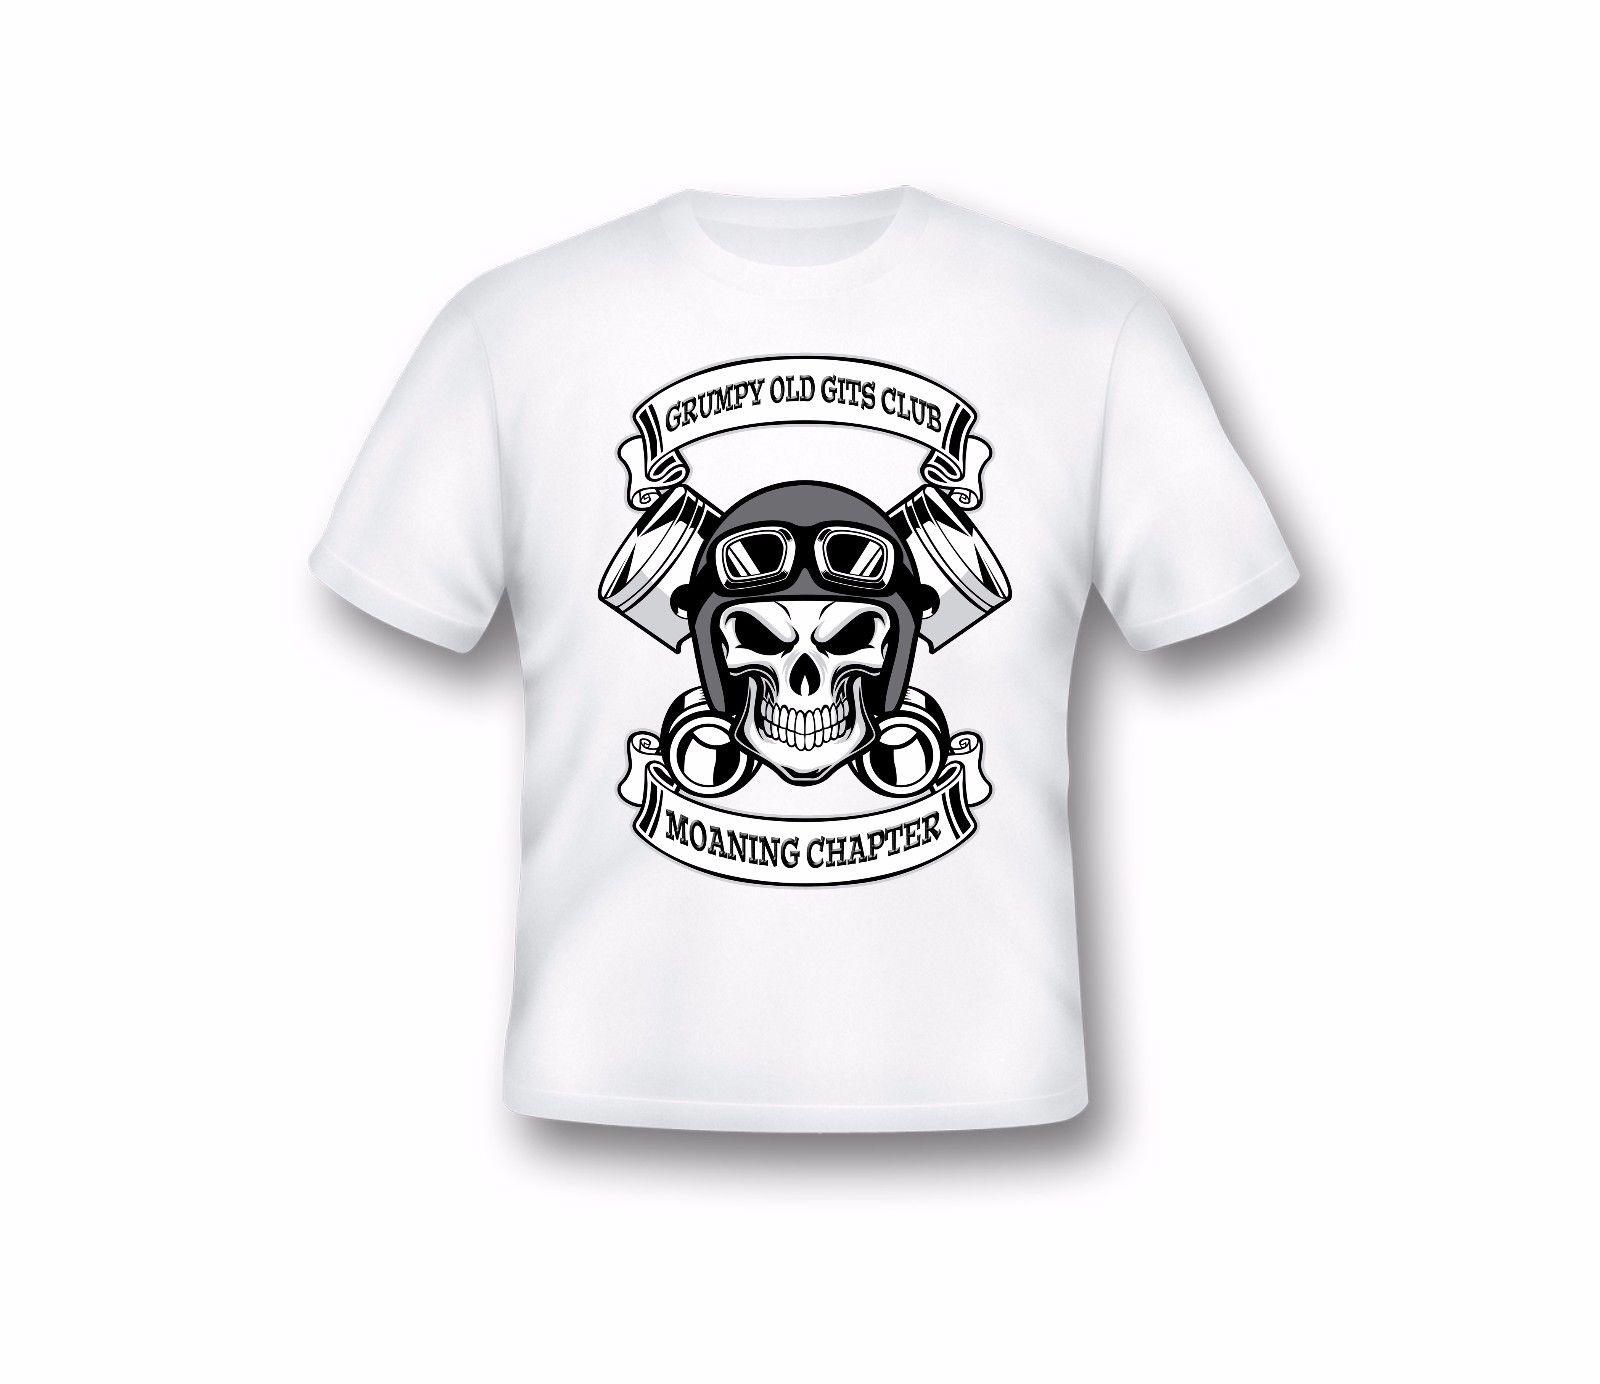 "Camiseta a la moda para hombre, ropa para hombre, camiseta con texto ""Gits viejos gruñones"", camiseta divertida para hombre, camiseta divertida con cuello redondo para ciclistas"